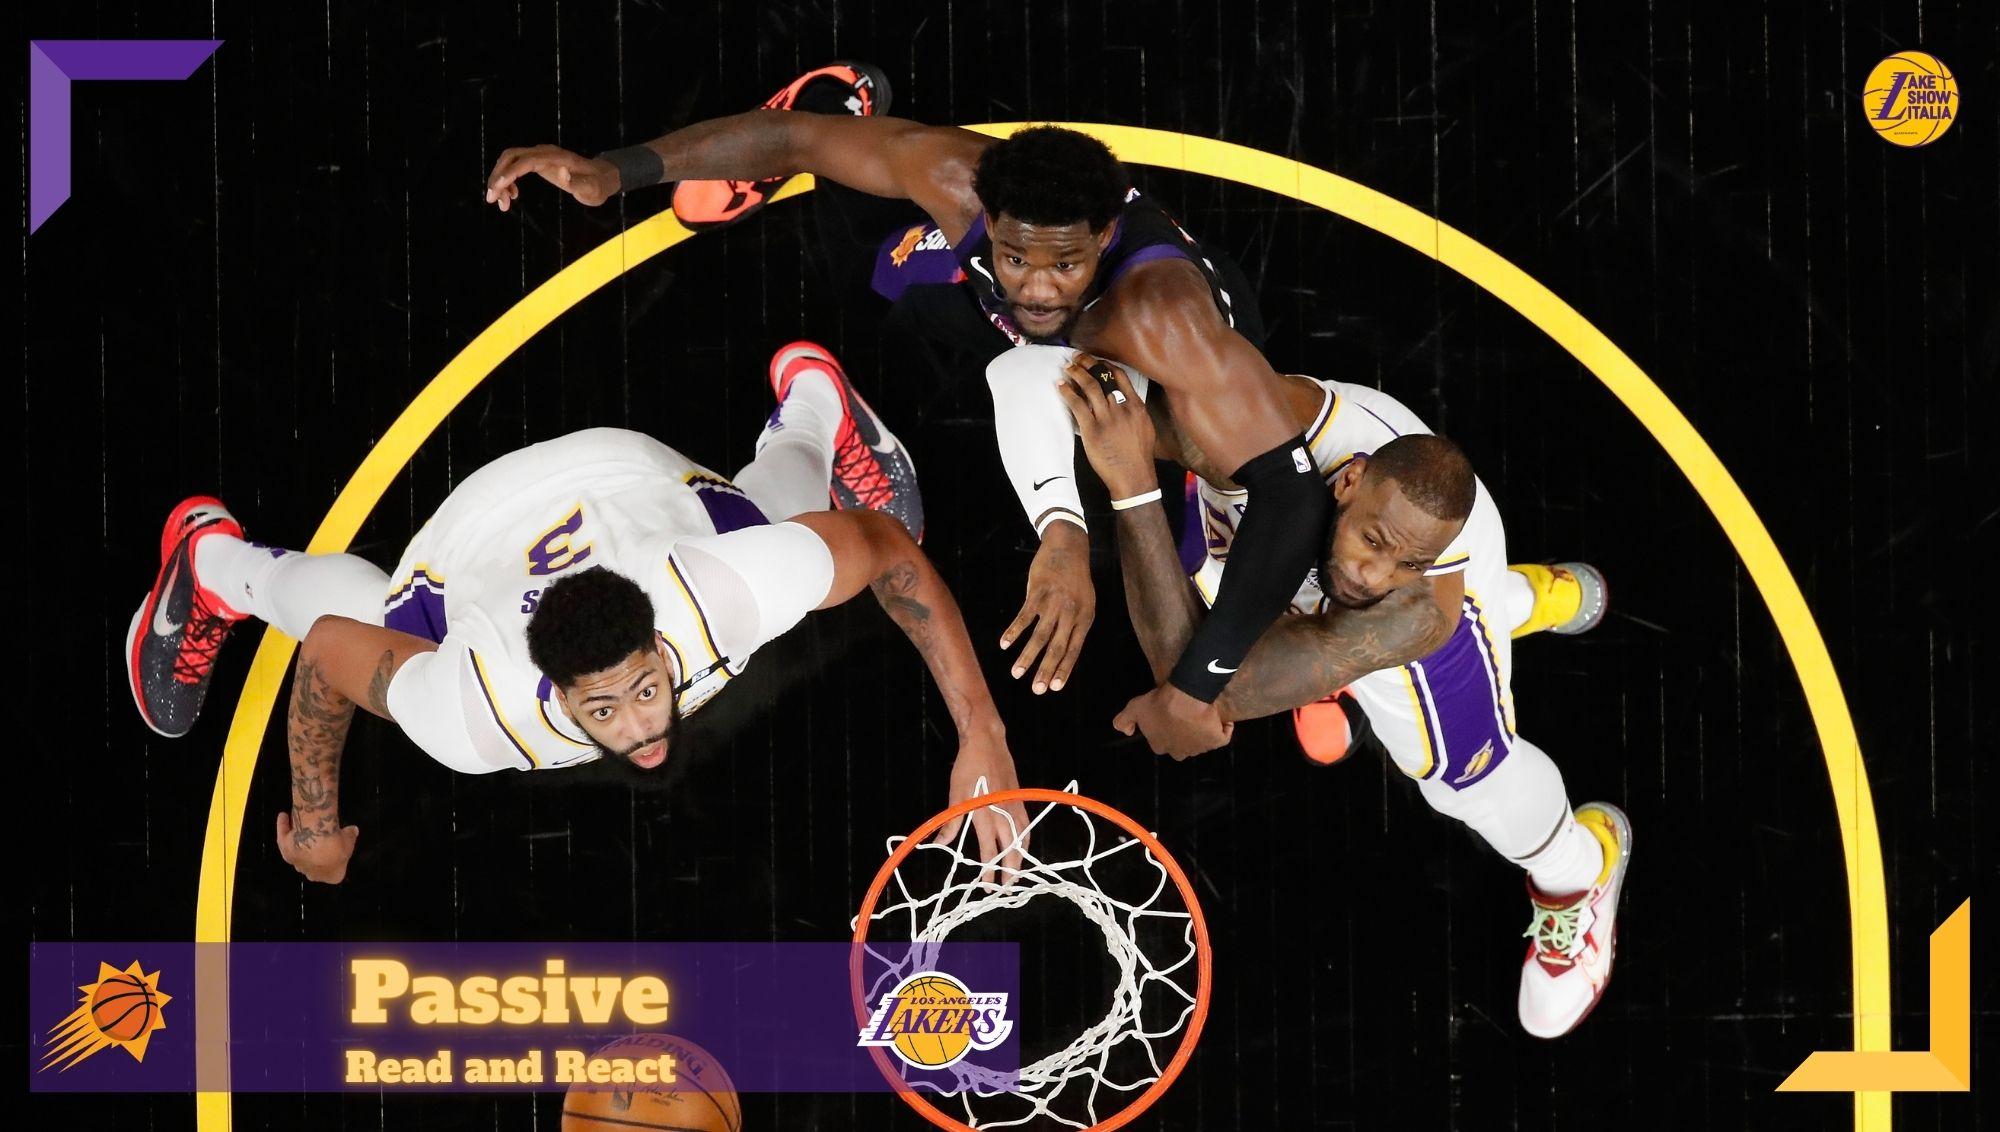 Anthony Davis, Deandre Ayton and LeBron James. Los Angeles Lakers vs Phoenix Suns on May 23, 2021 at Phoenix Suns Arena in Phoenix, Arizona.